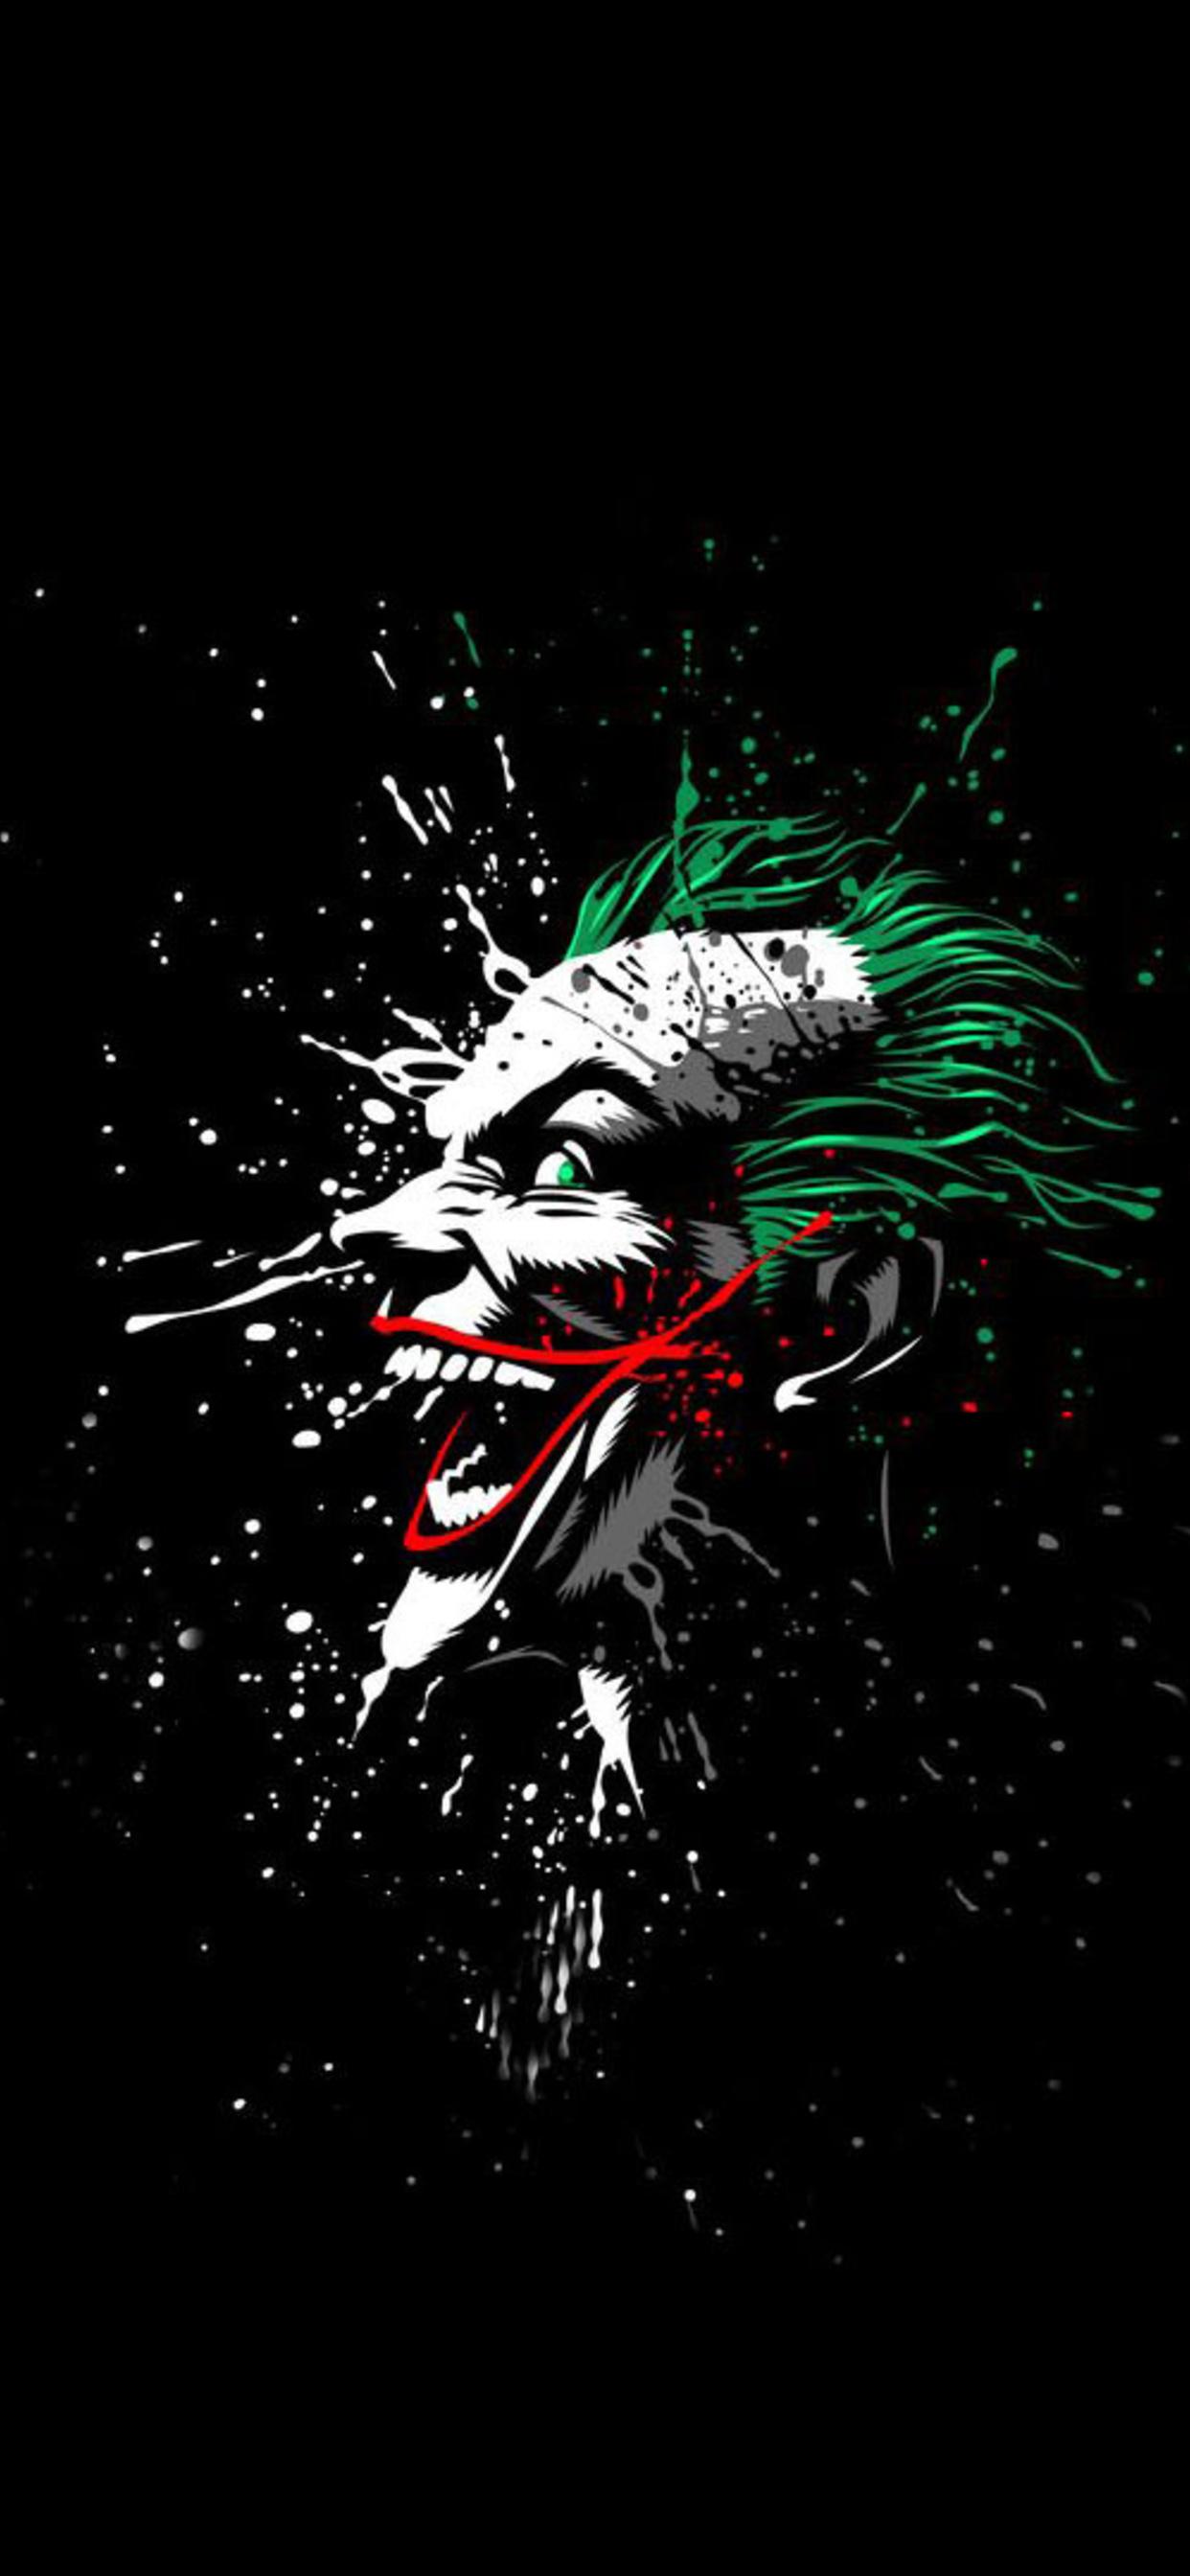 1242x2688 Joker Artwork Iphone Xs Max Hd 4k Wallpapers Images